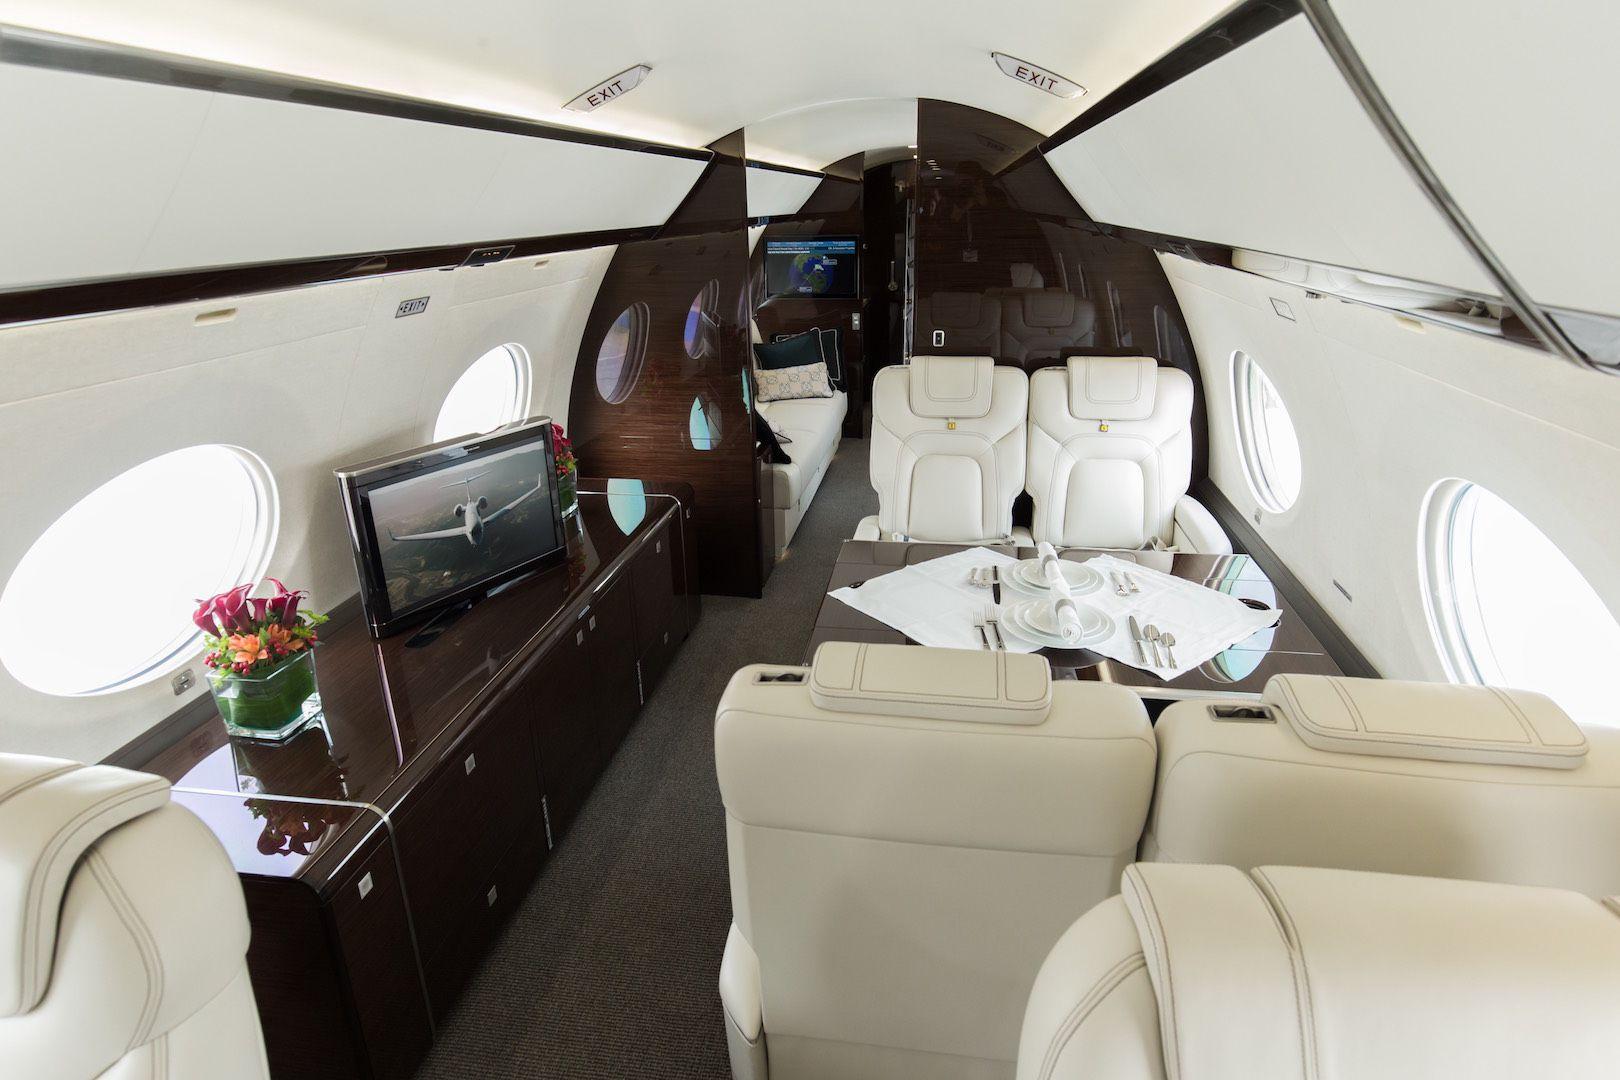 Gulfstream G650 Gulfstream G650 Toys